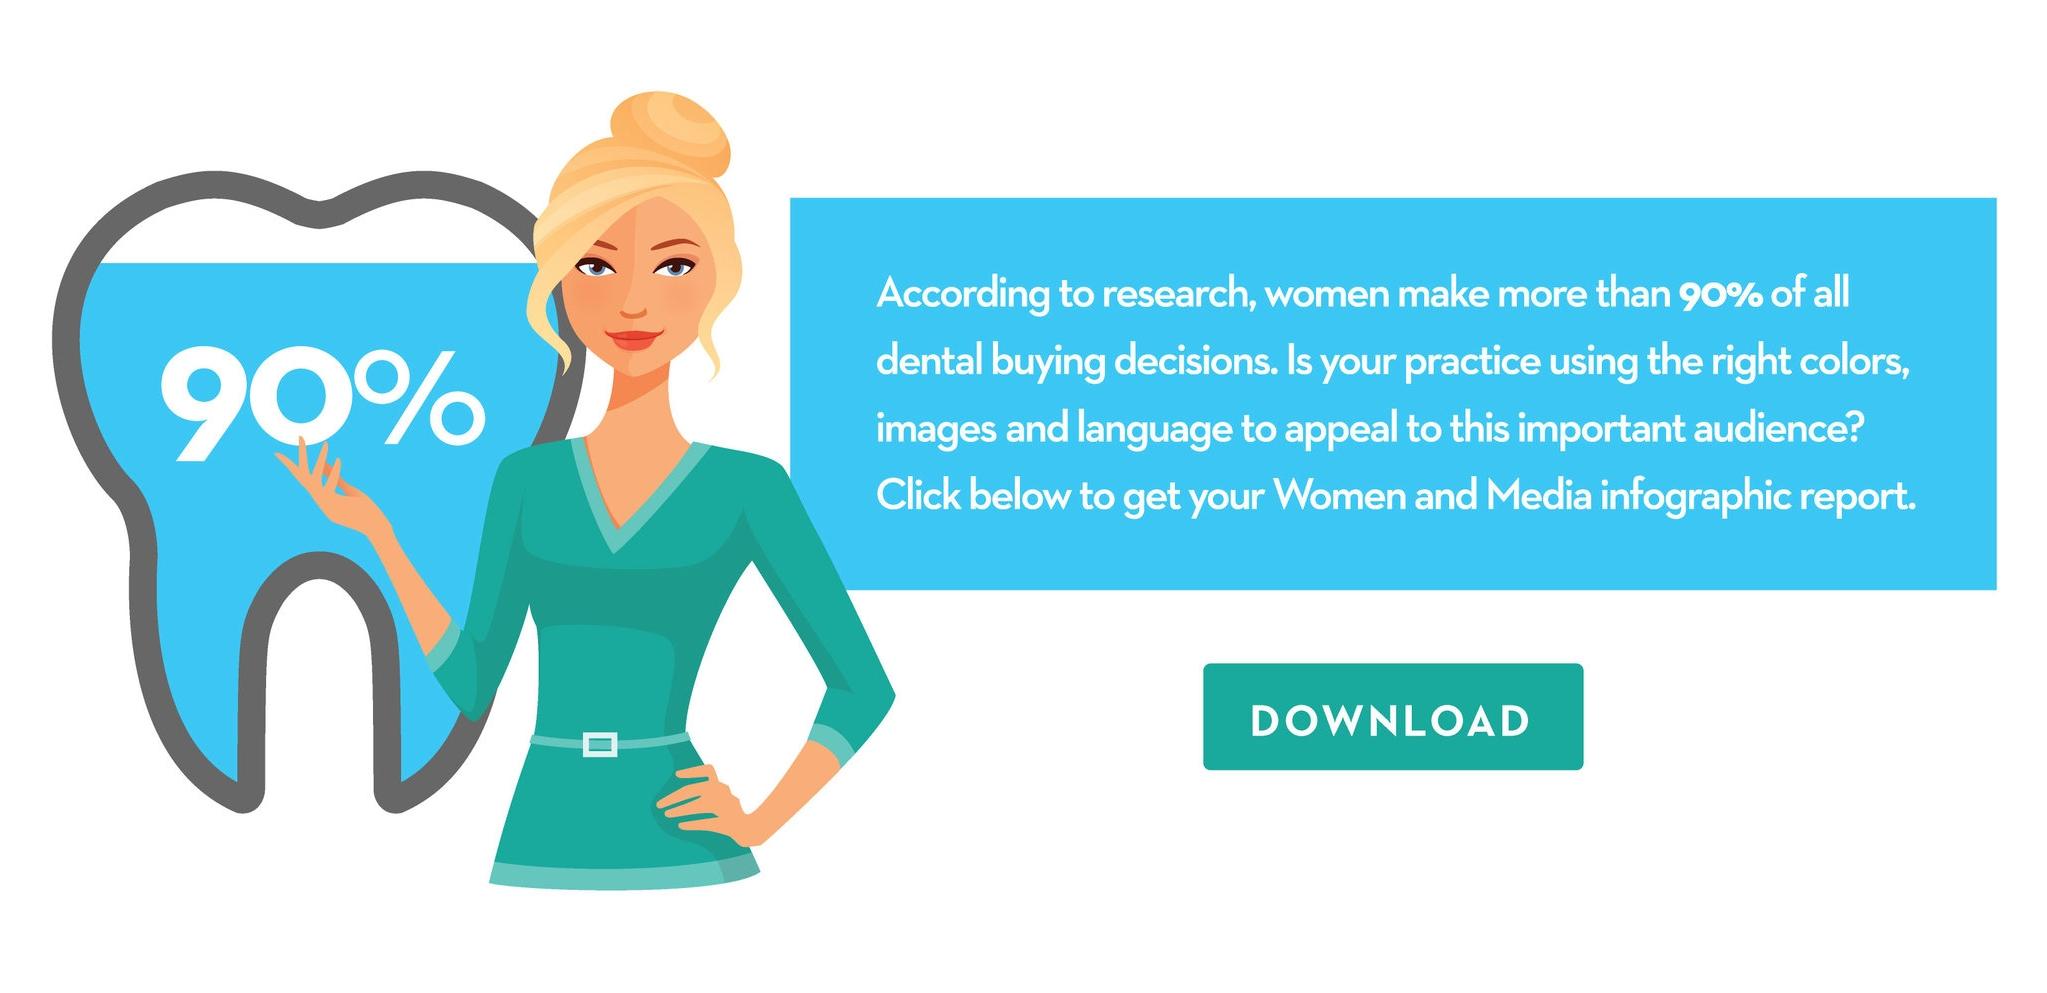 DentalInfographicWoman.jpg